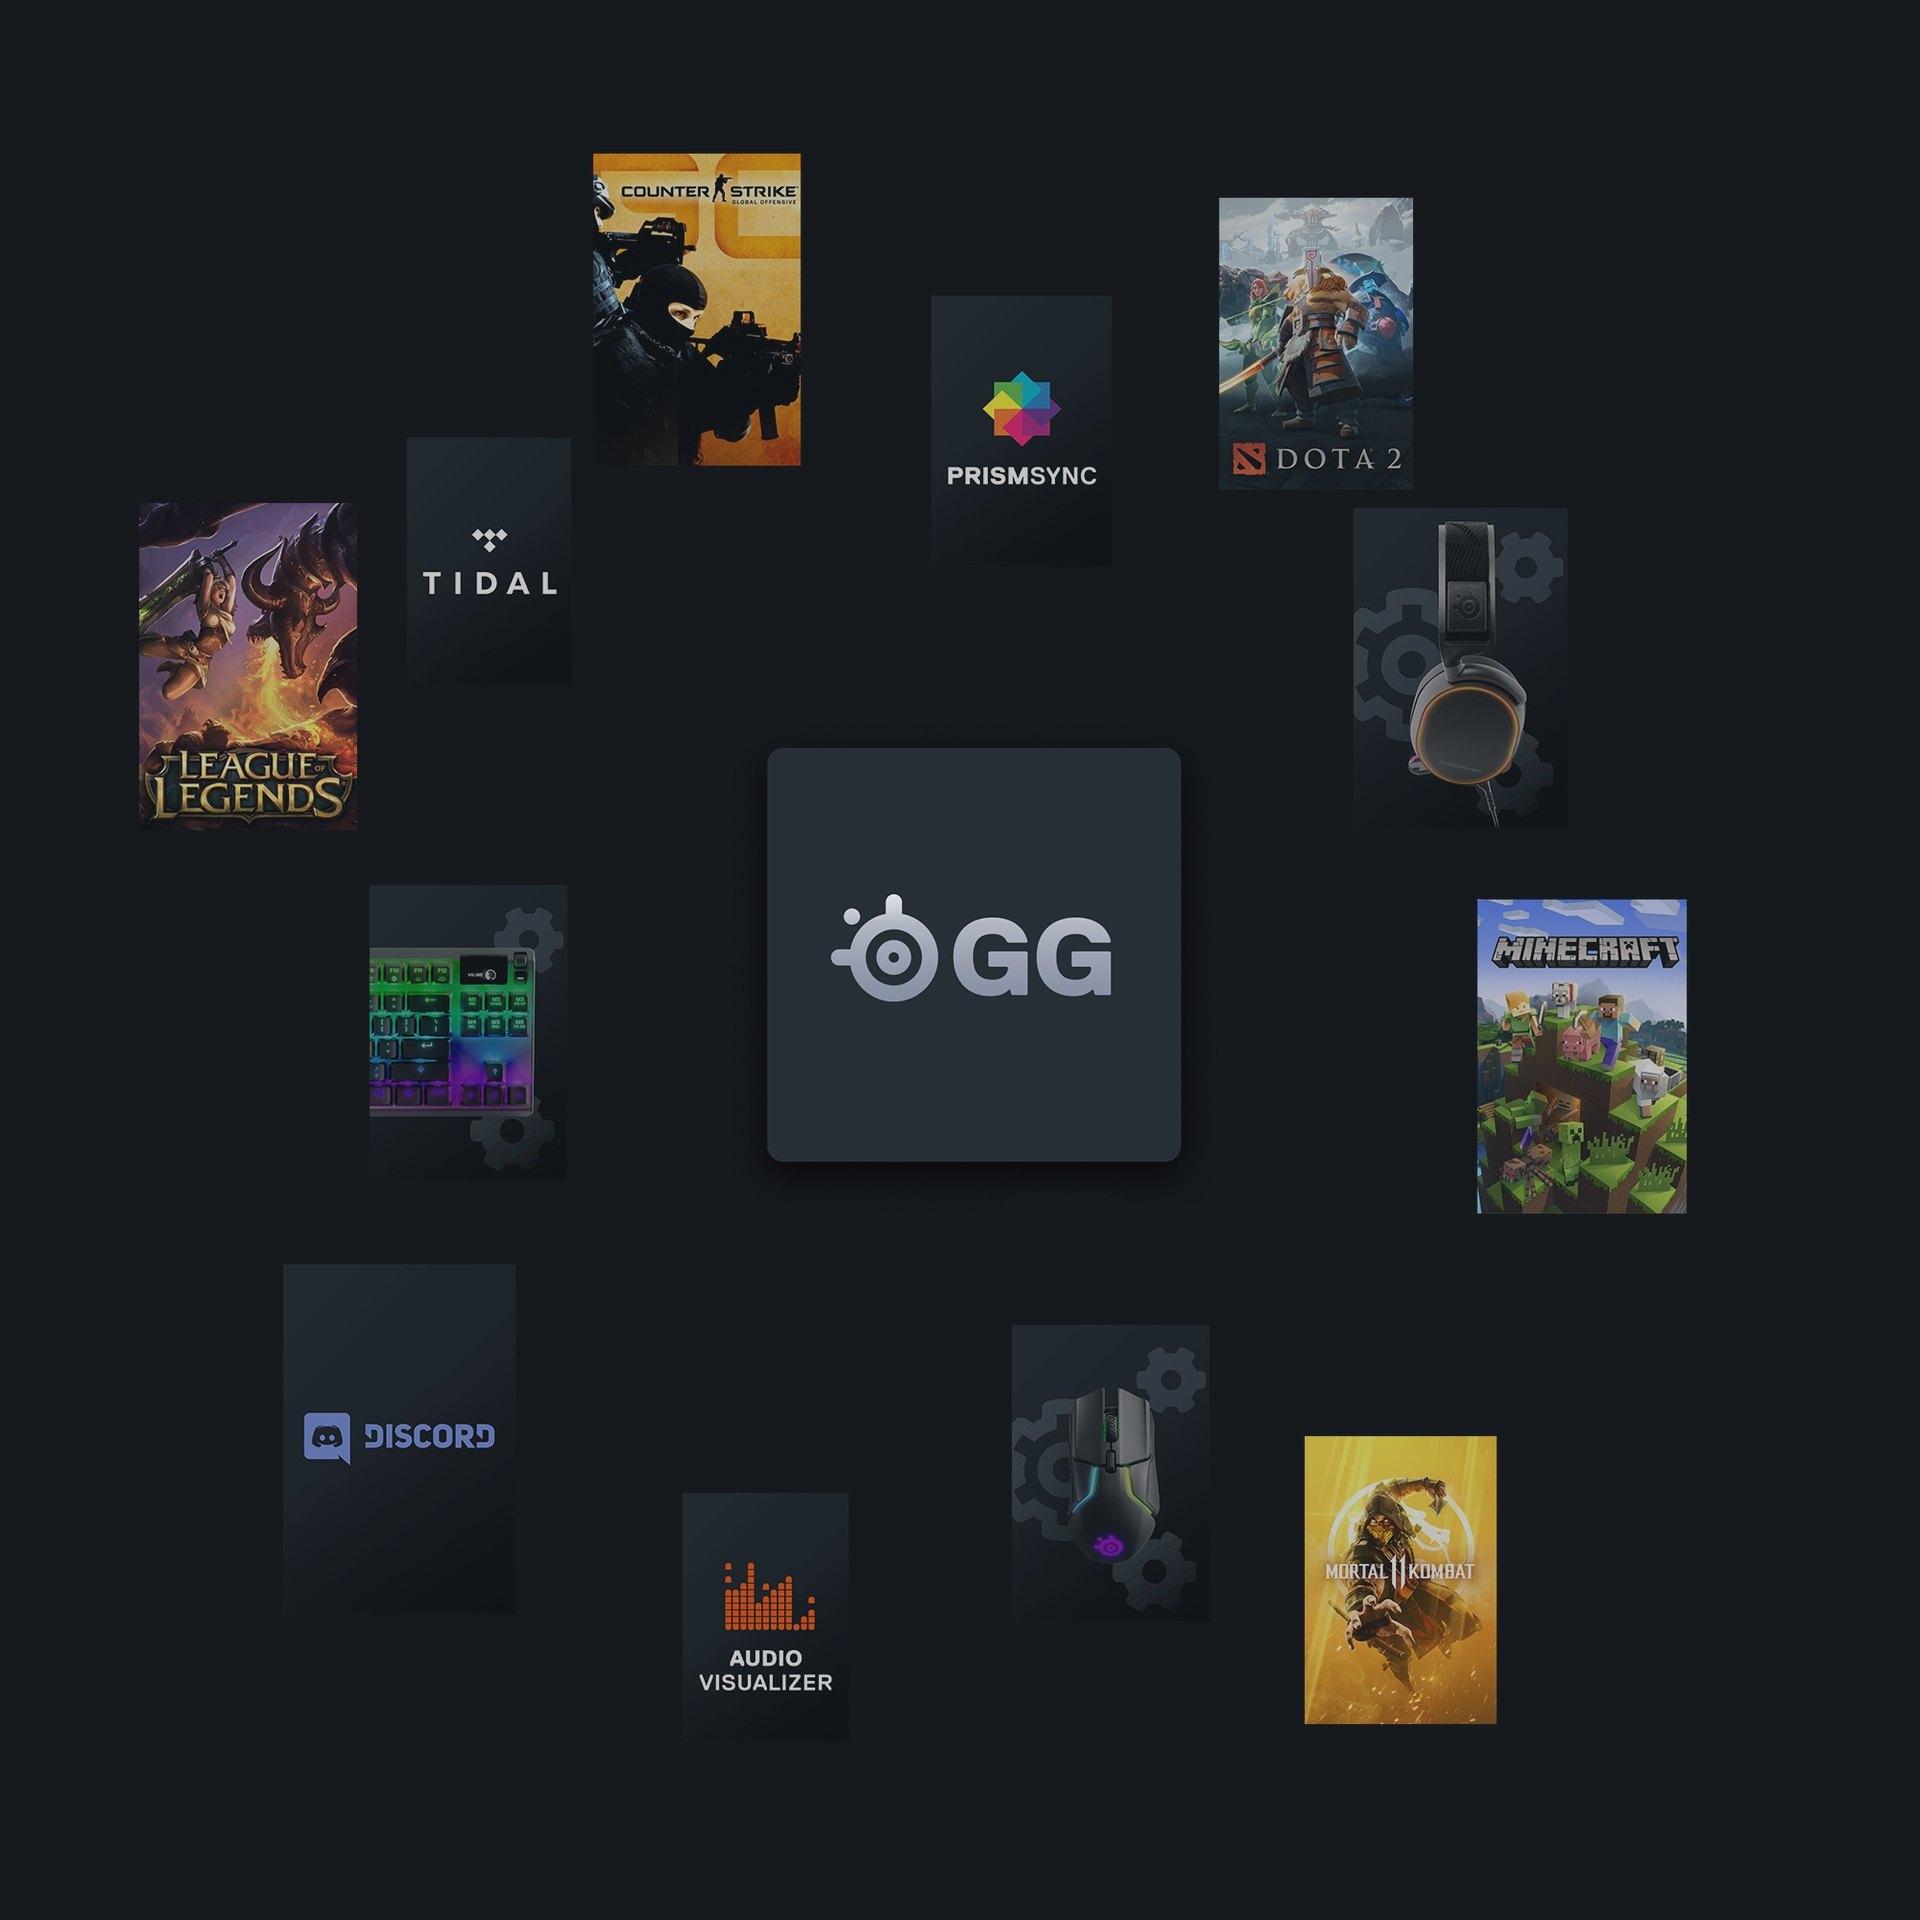 SteelSeries GG 測試版;《英雄聯盟》、《絕對武力:全球攻勢》、《國王遊戲》、PRISMSYNC、《魔獸爭霸》2、《當個創世神》、《真人快打》11、音訊顯示器、Discord